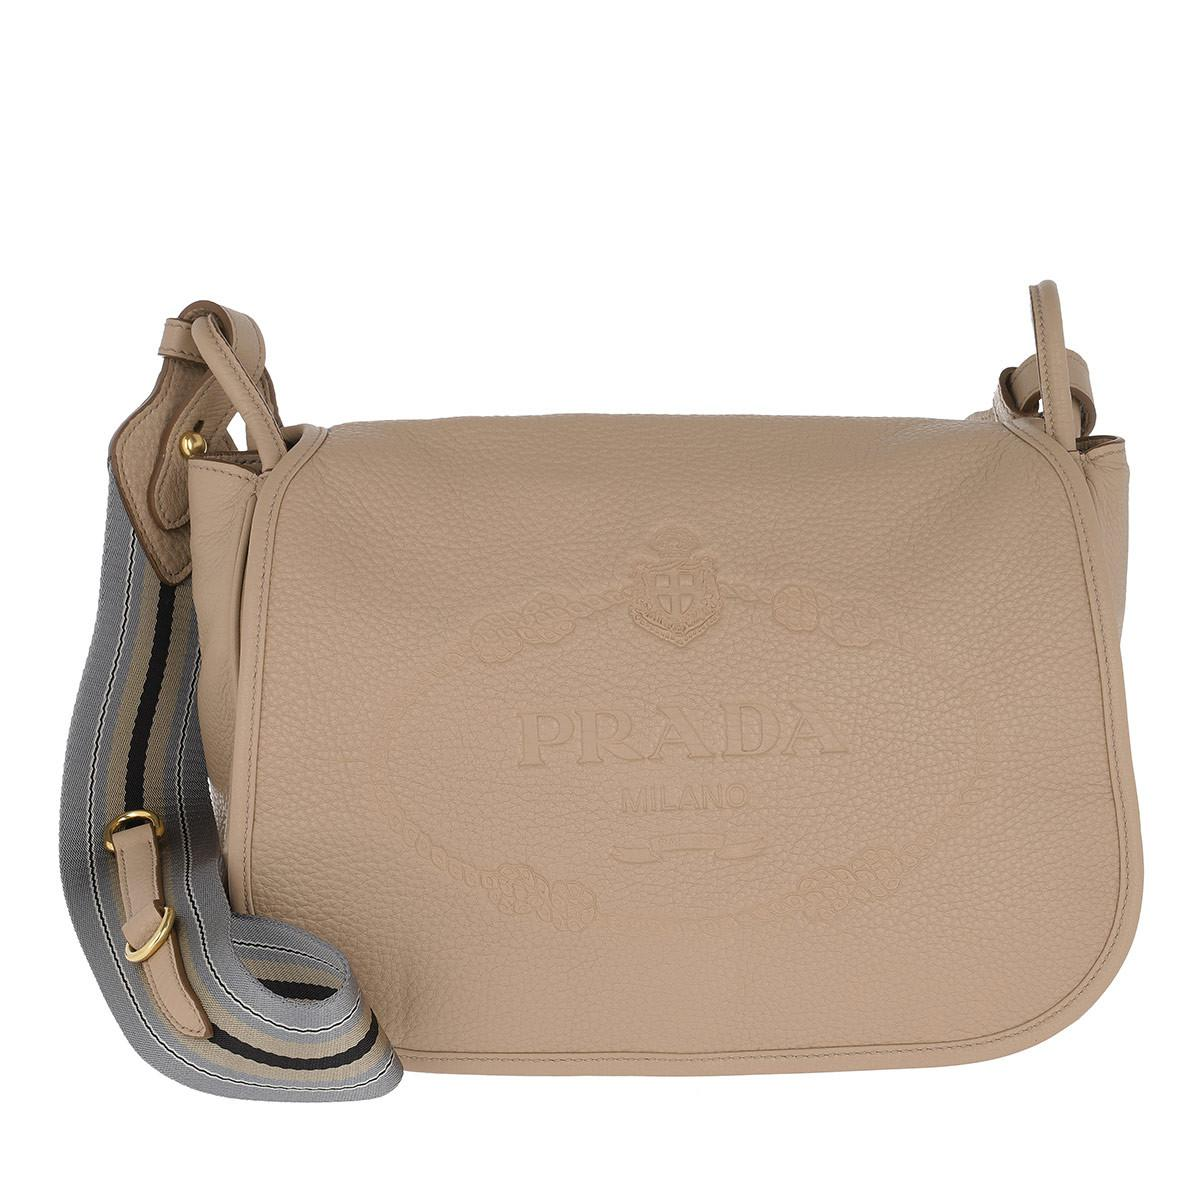 Cross Body Bags - Deer Print Crossbody Bag Leather Cammeo - beige - Cross Body Bags for ladies Prada SLeGGpp5